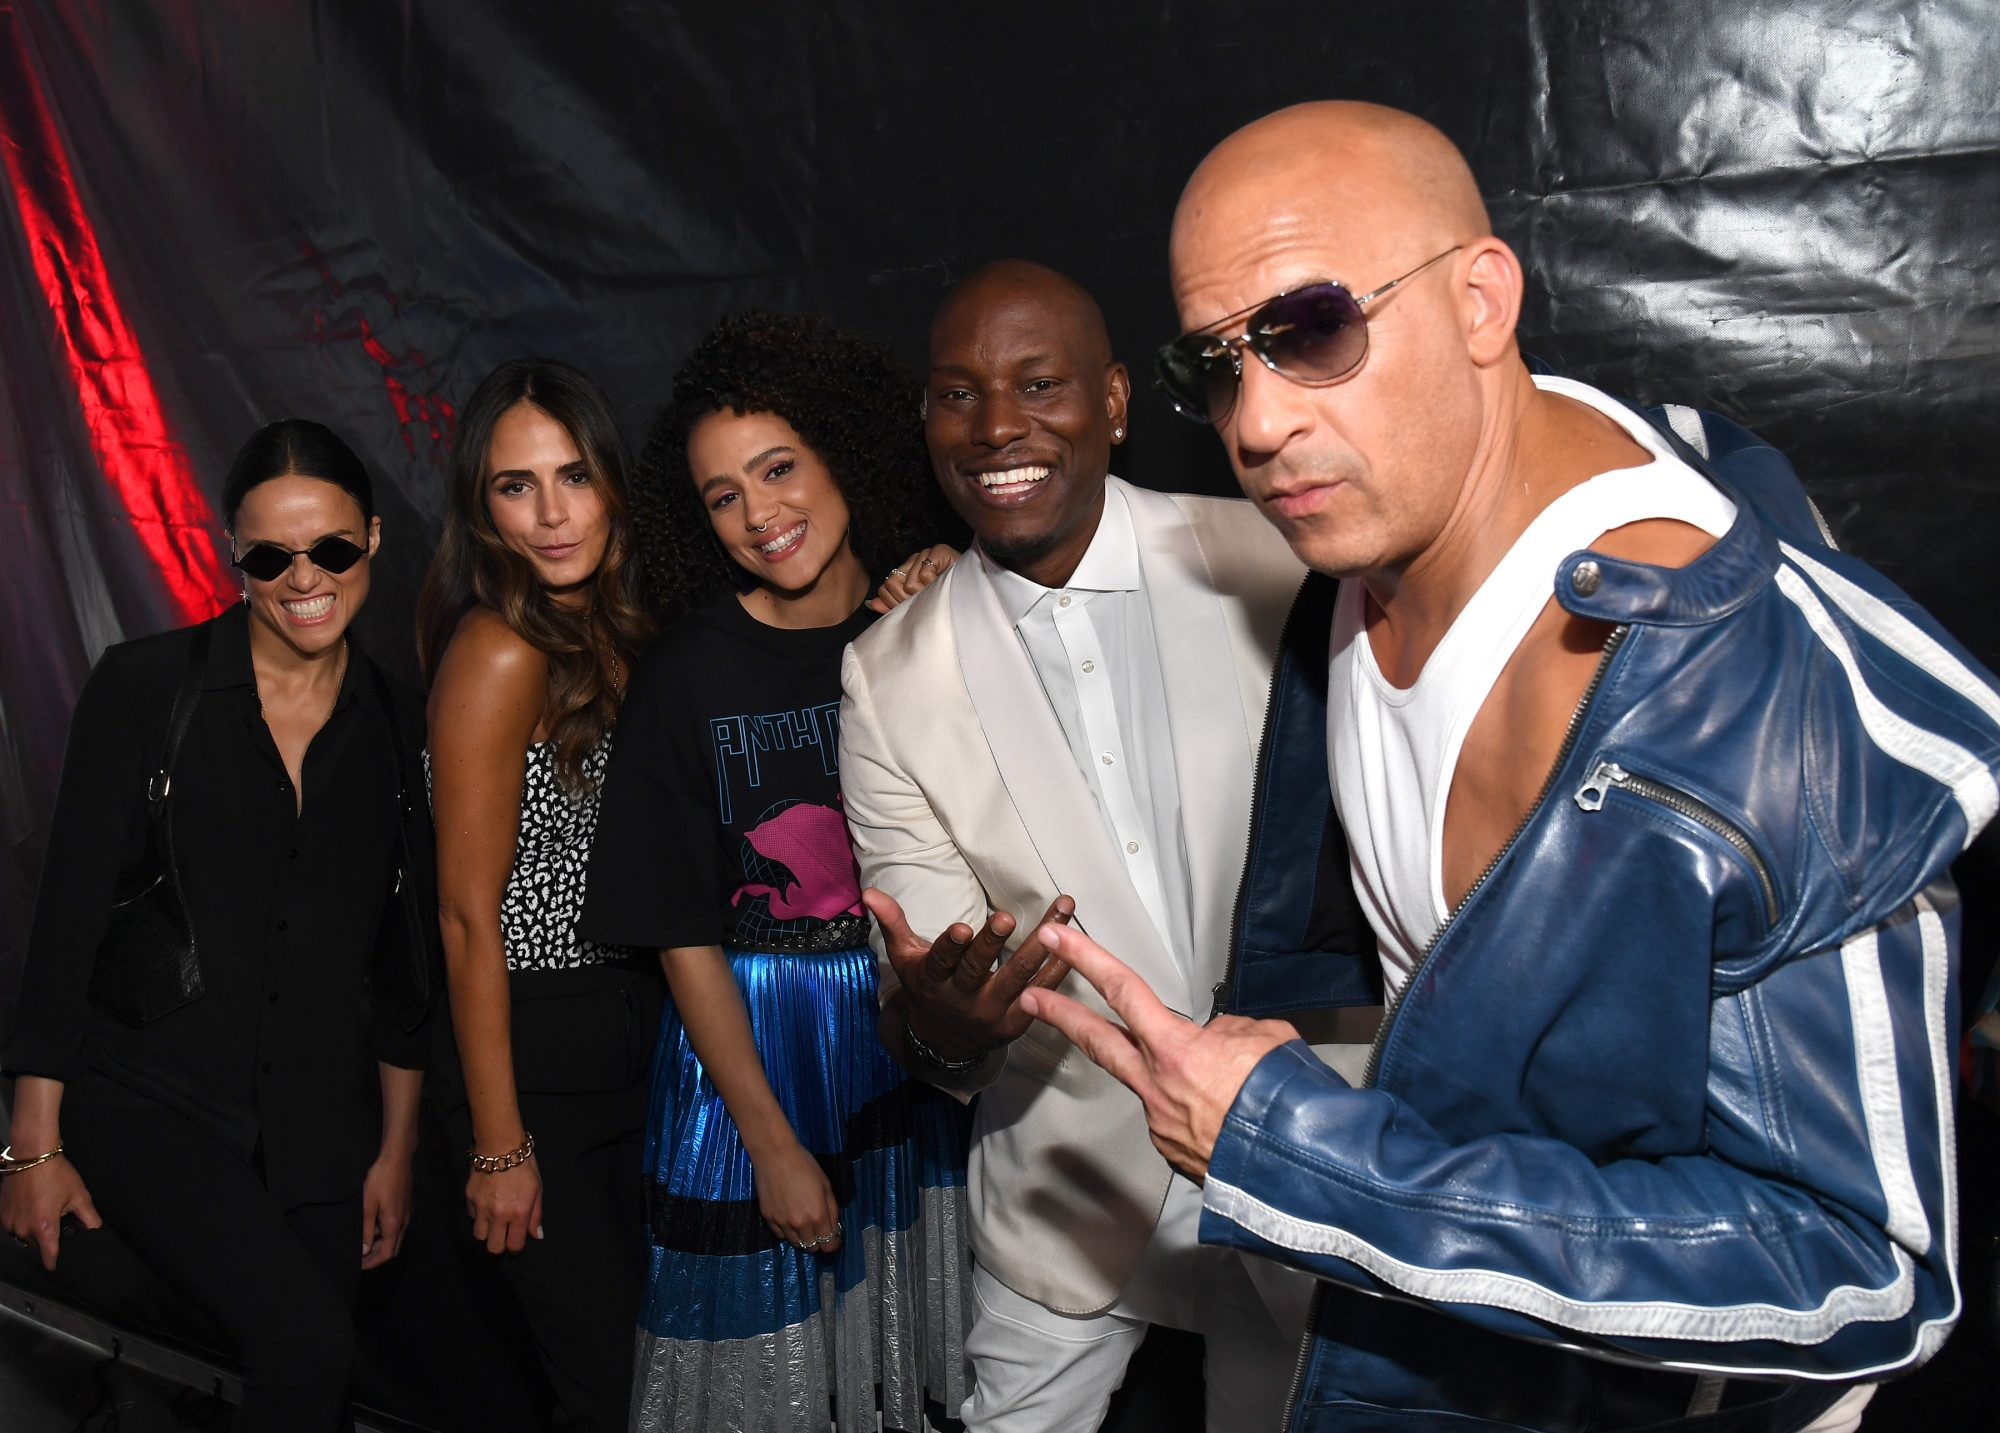 Michelle Rodriguez, Jordana Brewster, Nathalie Emmanuel, Tyrese Gibson y Vin Diesel.